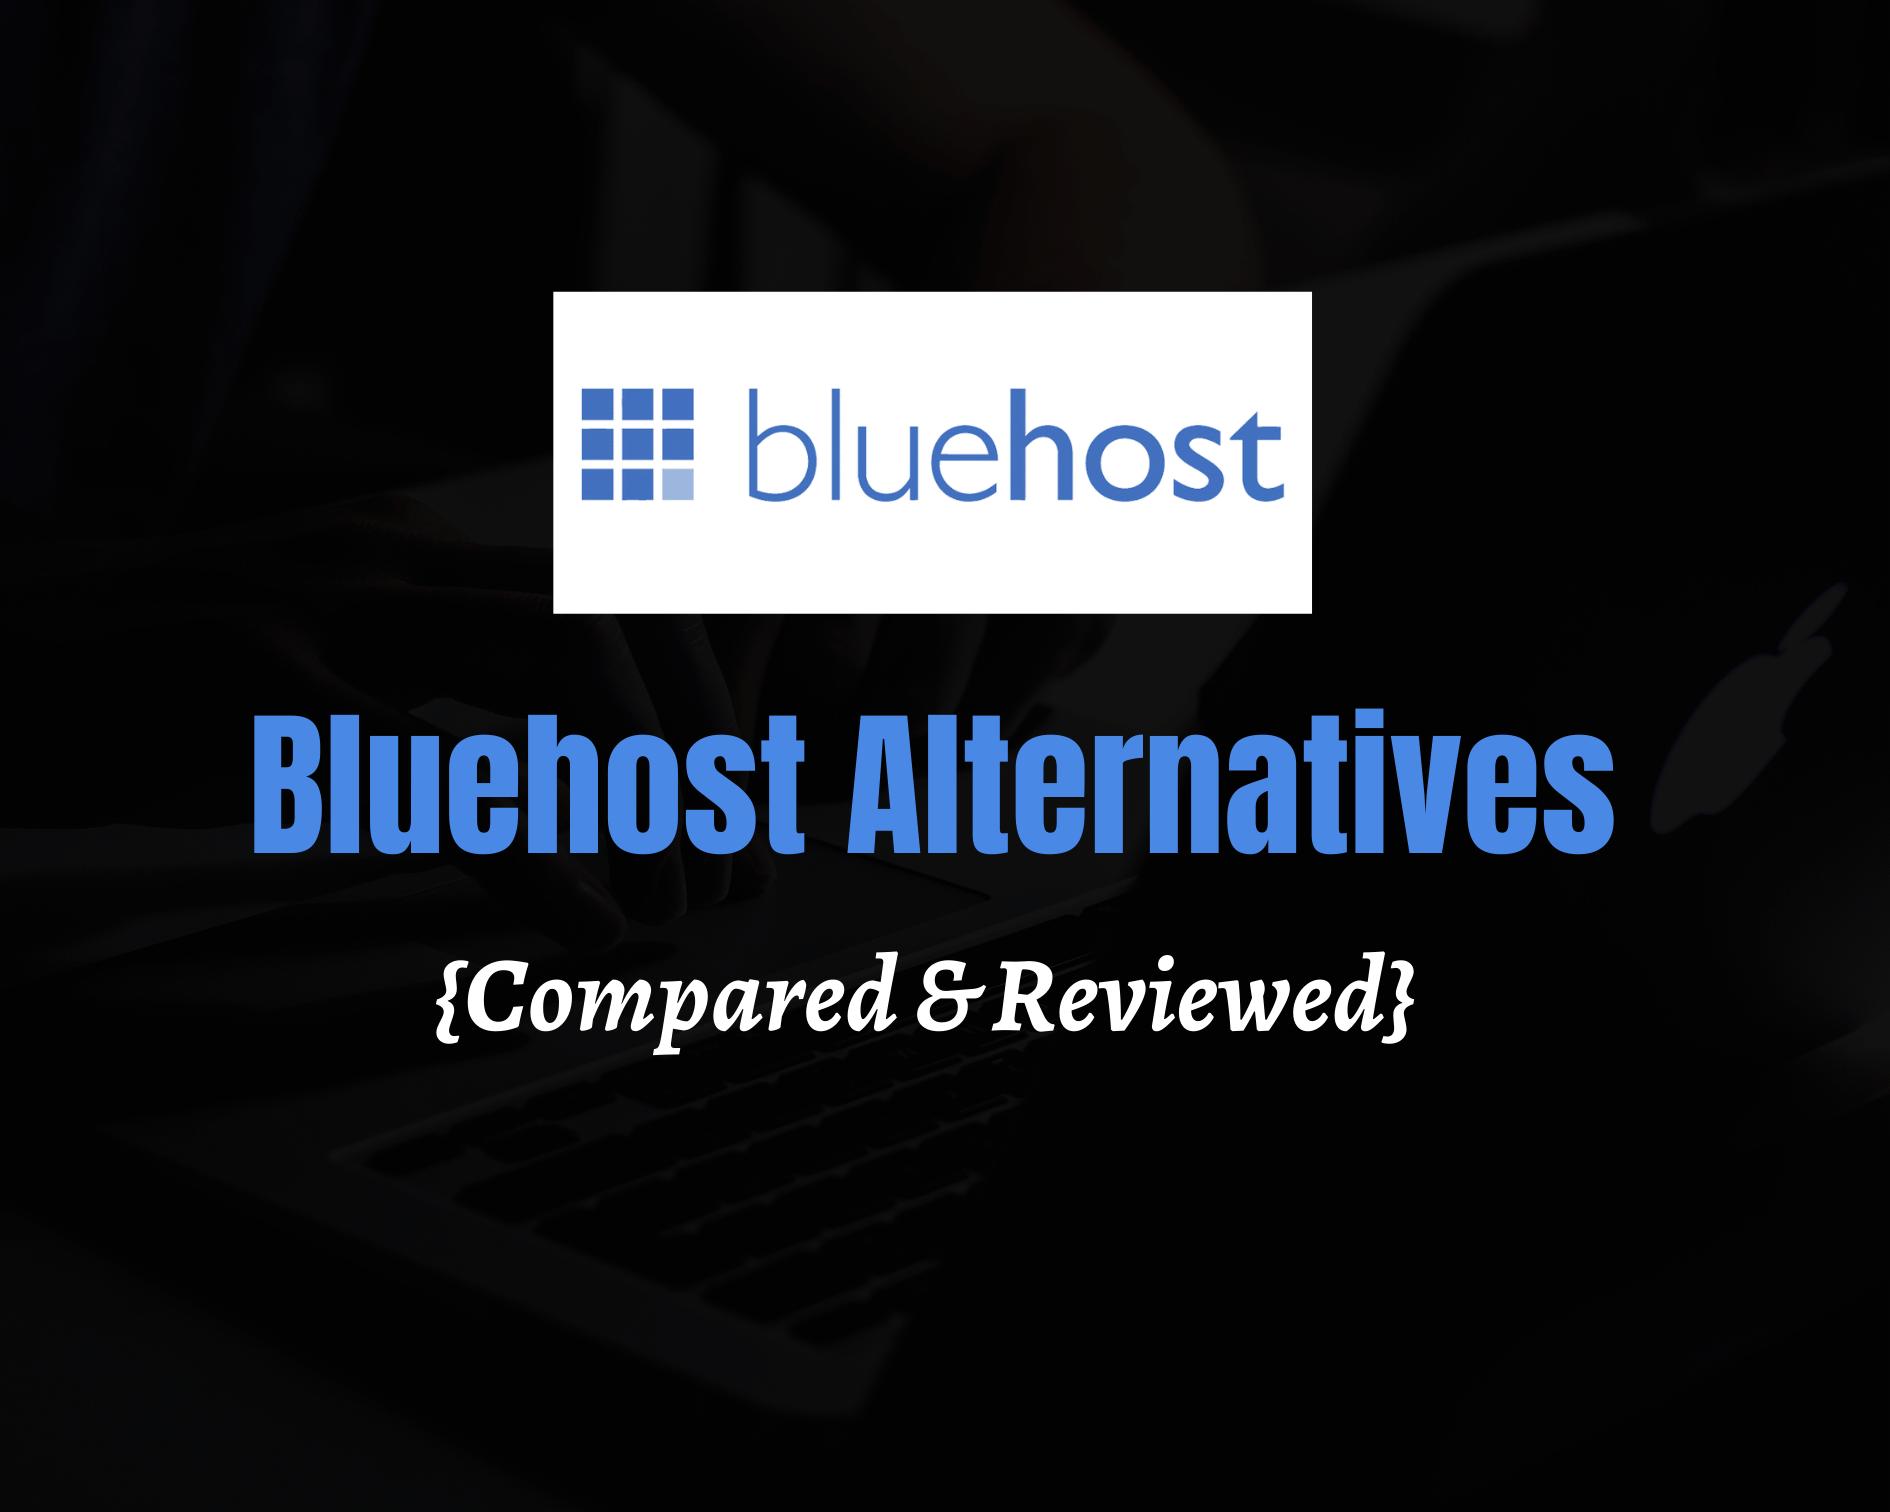 7 Best Bluehost Alternatives for 2020 [ Number #1 Is Best]